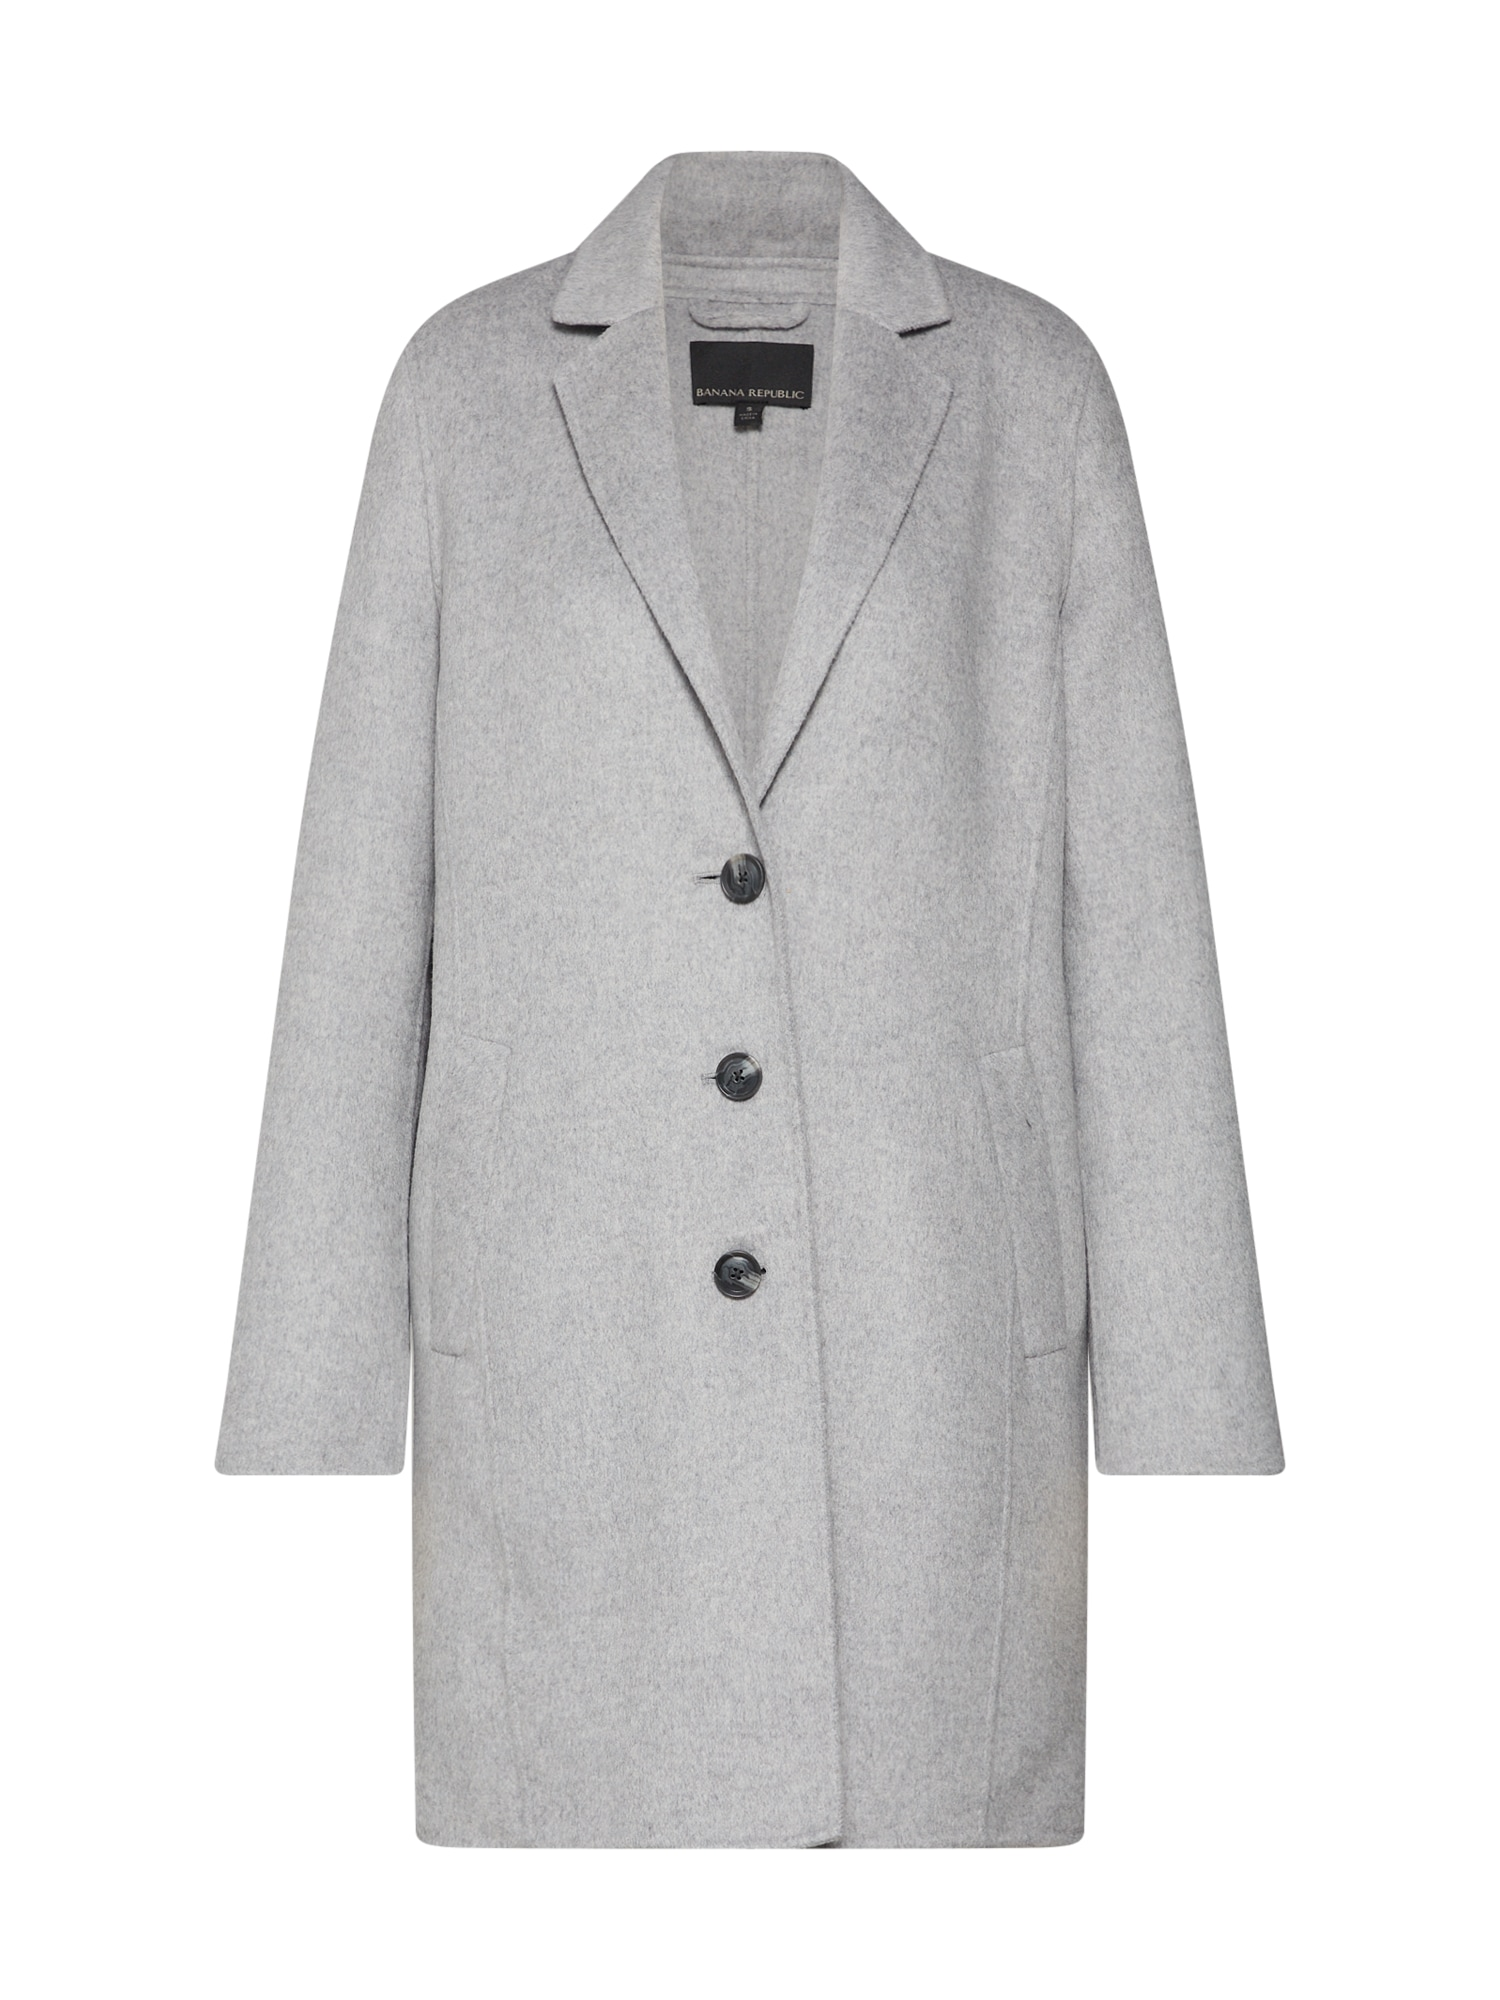 Banana Republic Rudeninis-žieminis paltas 'DOUBLE FACE TOP COAT' margai pilka